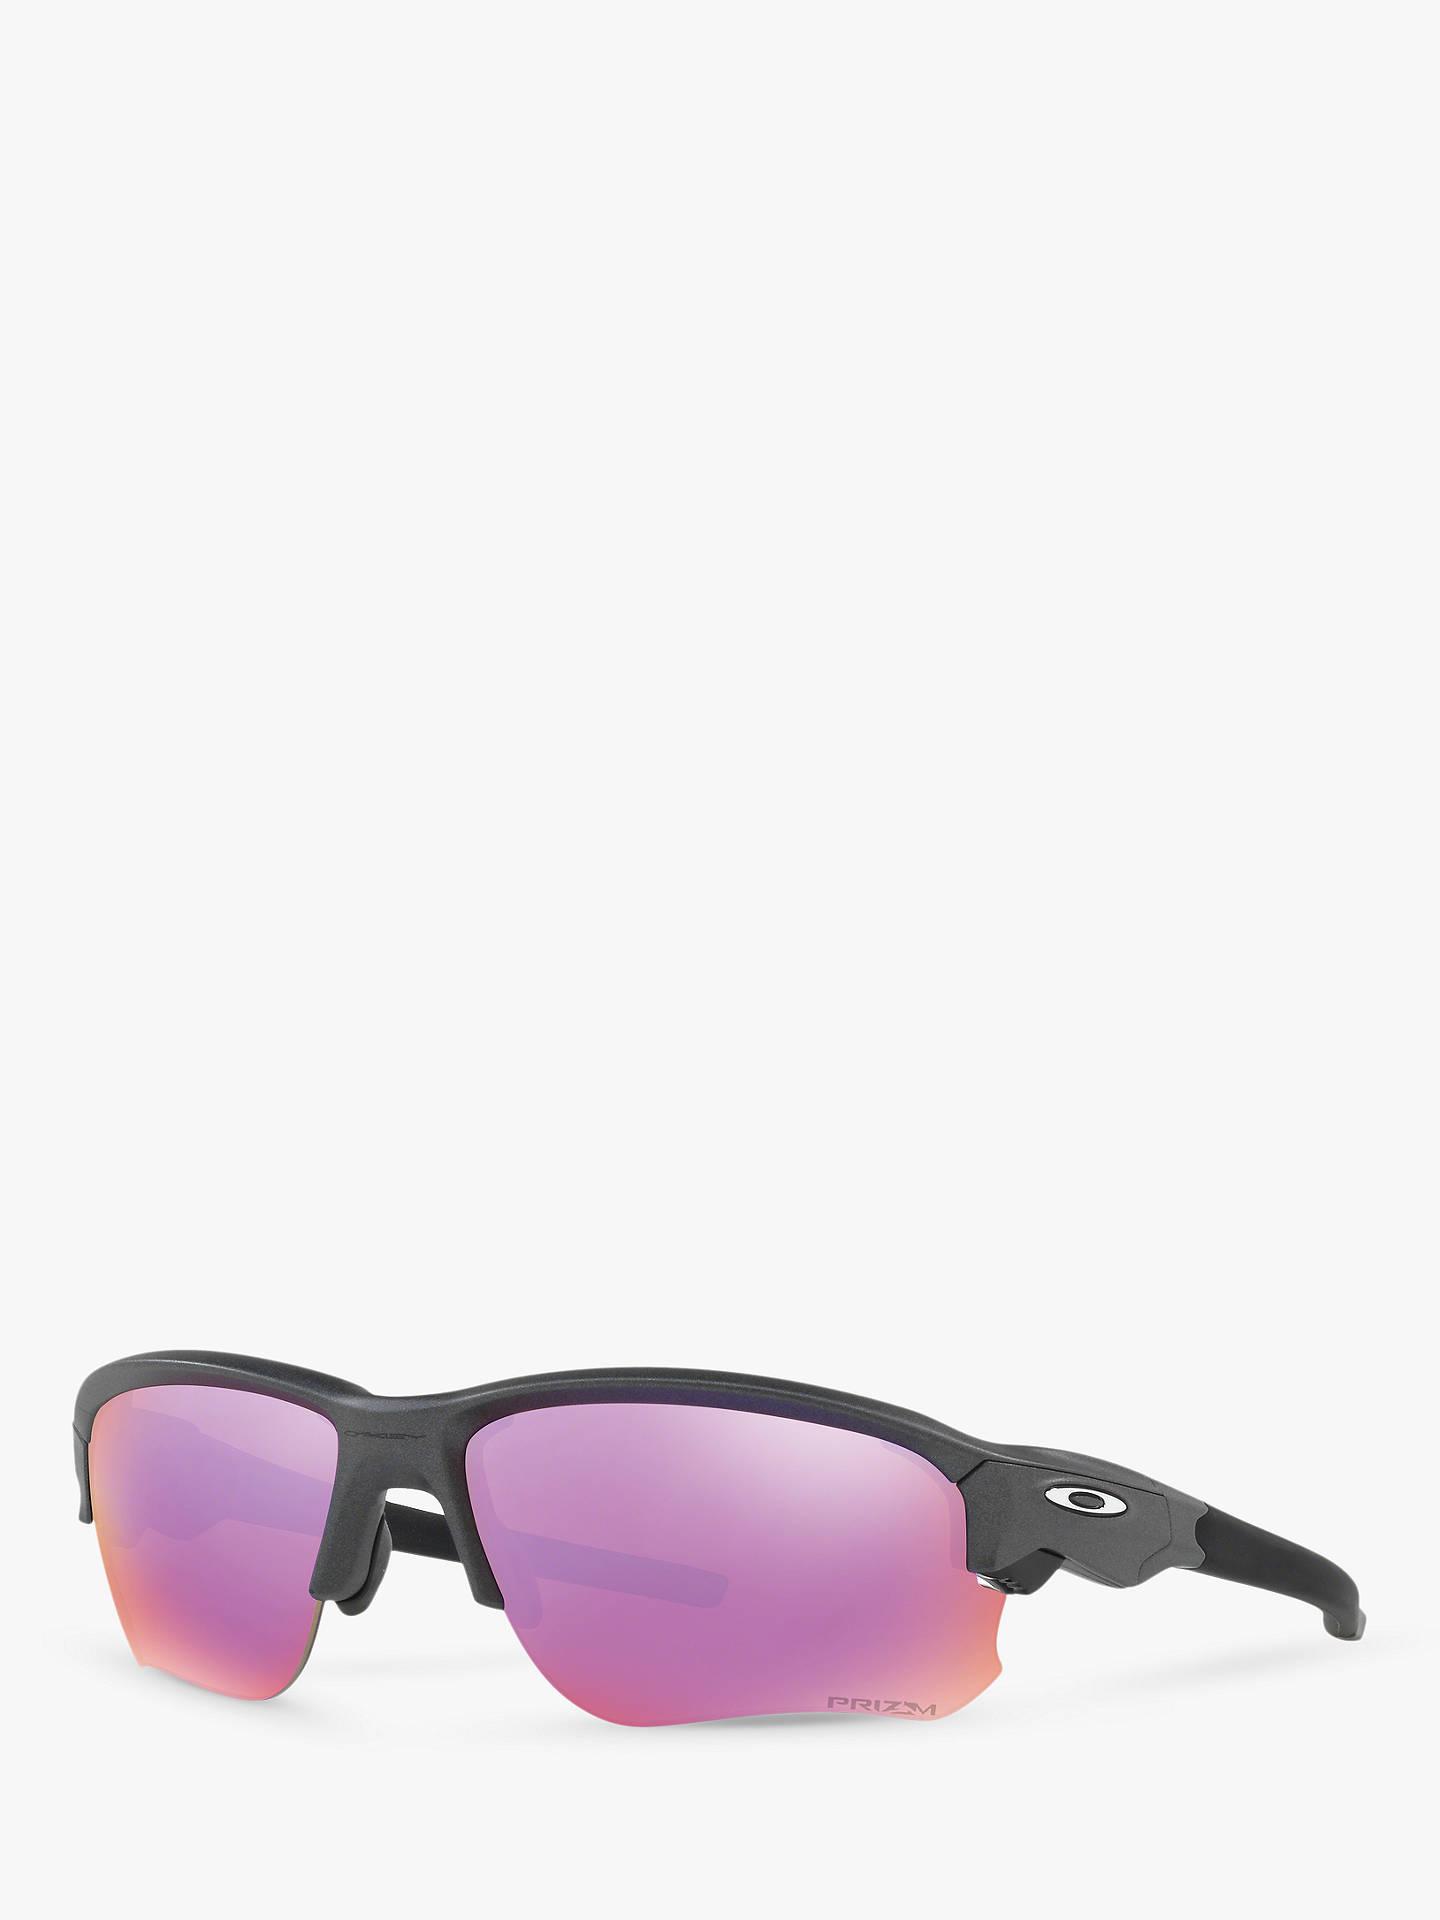 3b132d2c9f4 BuyOakley OO9364 Men s Flak Draft Prizm Wrap Sunglasses